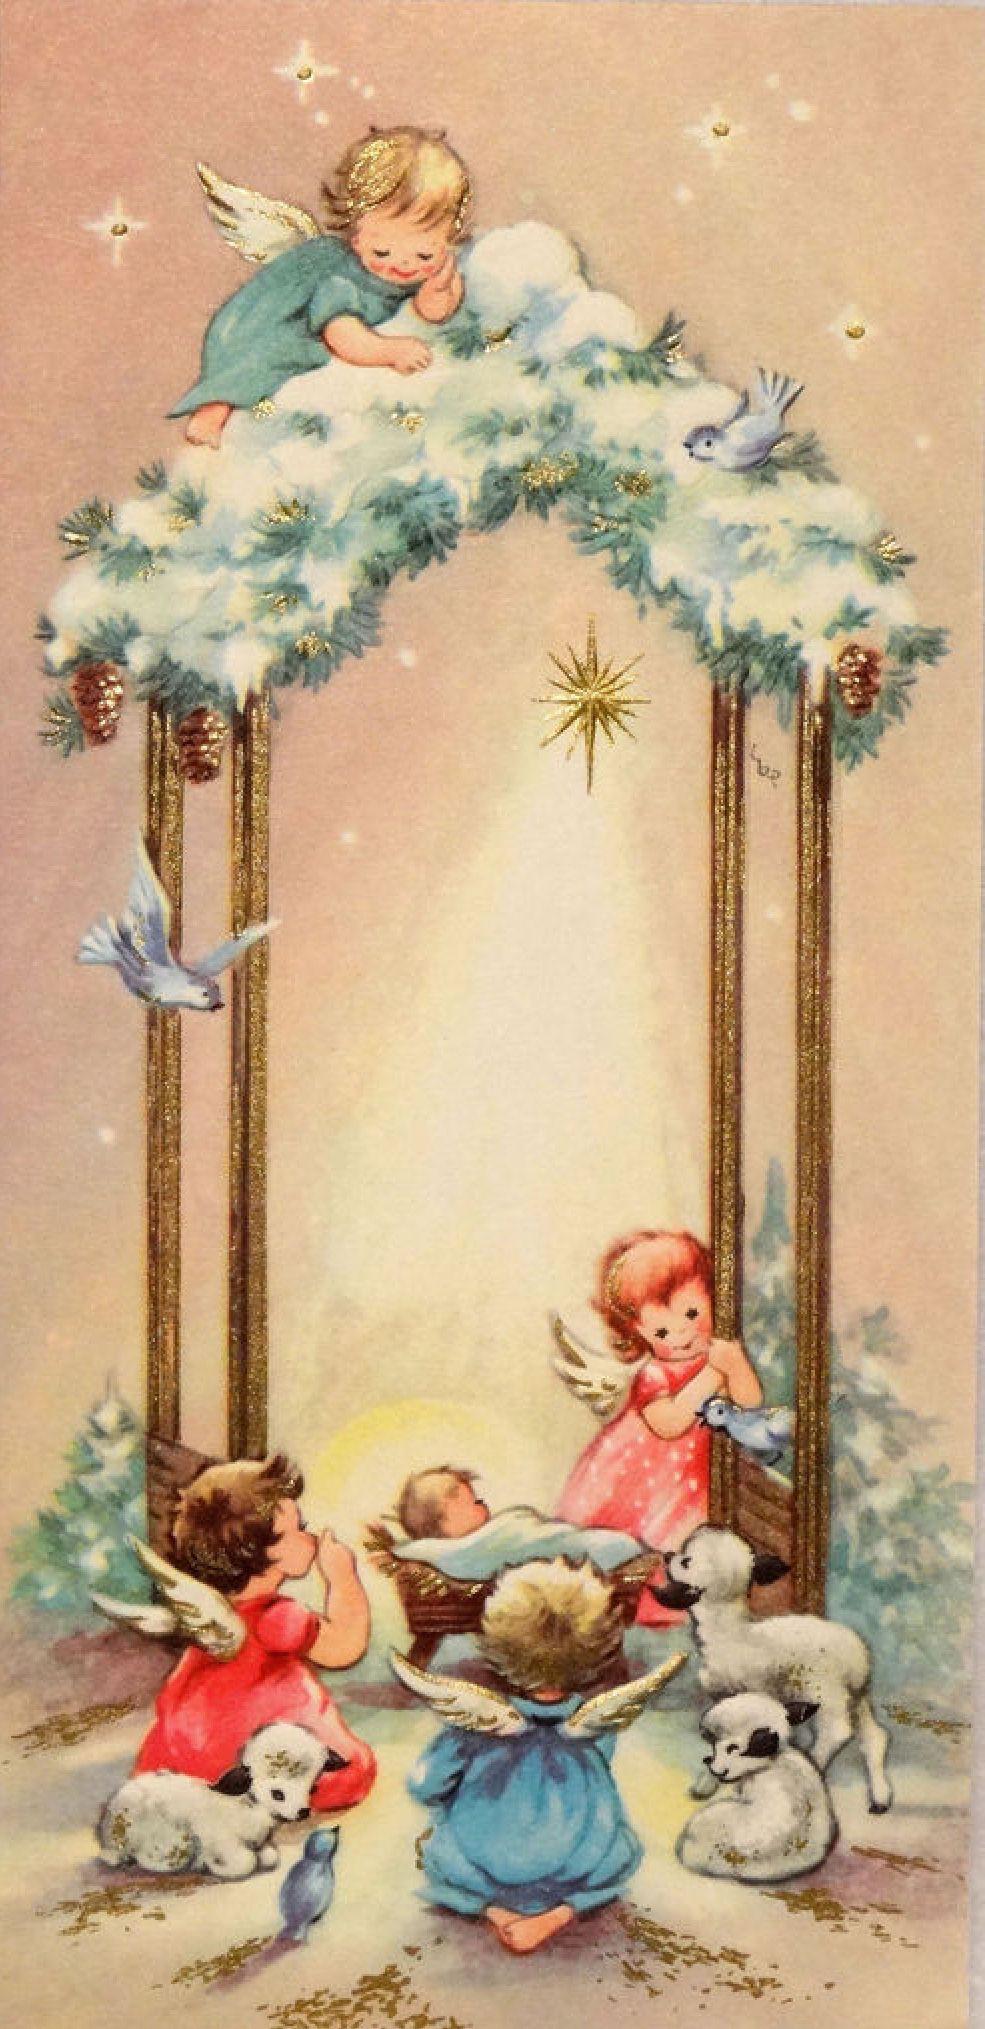 Vintage Christmas card   Vintage christmas cards, Vintage